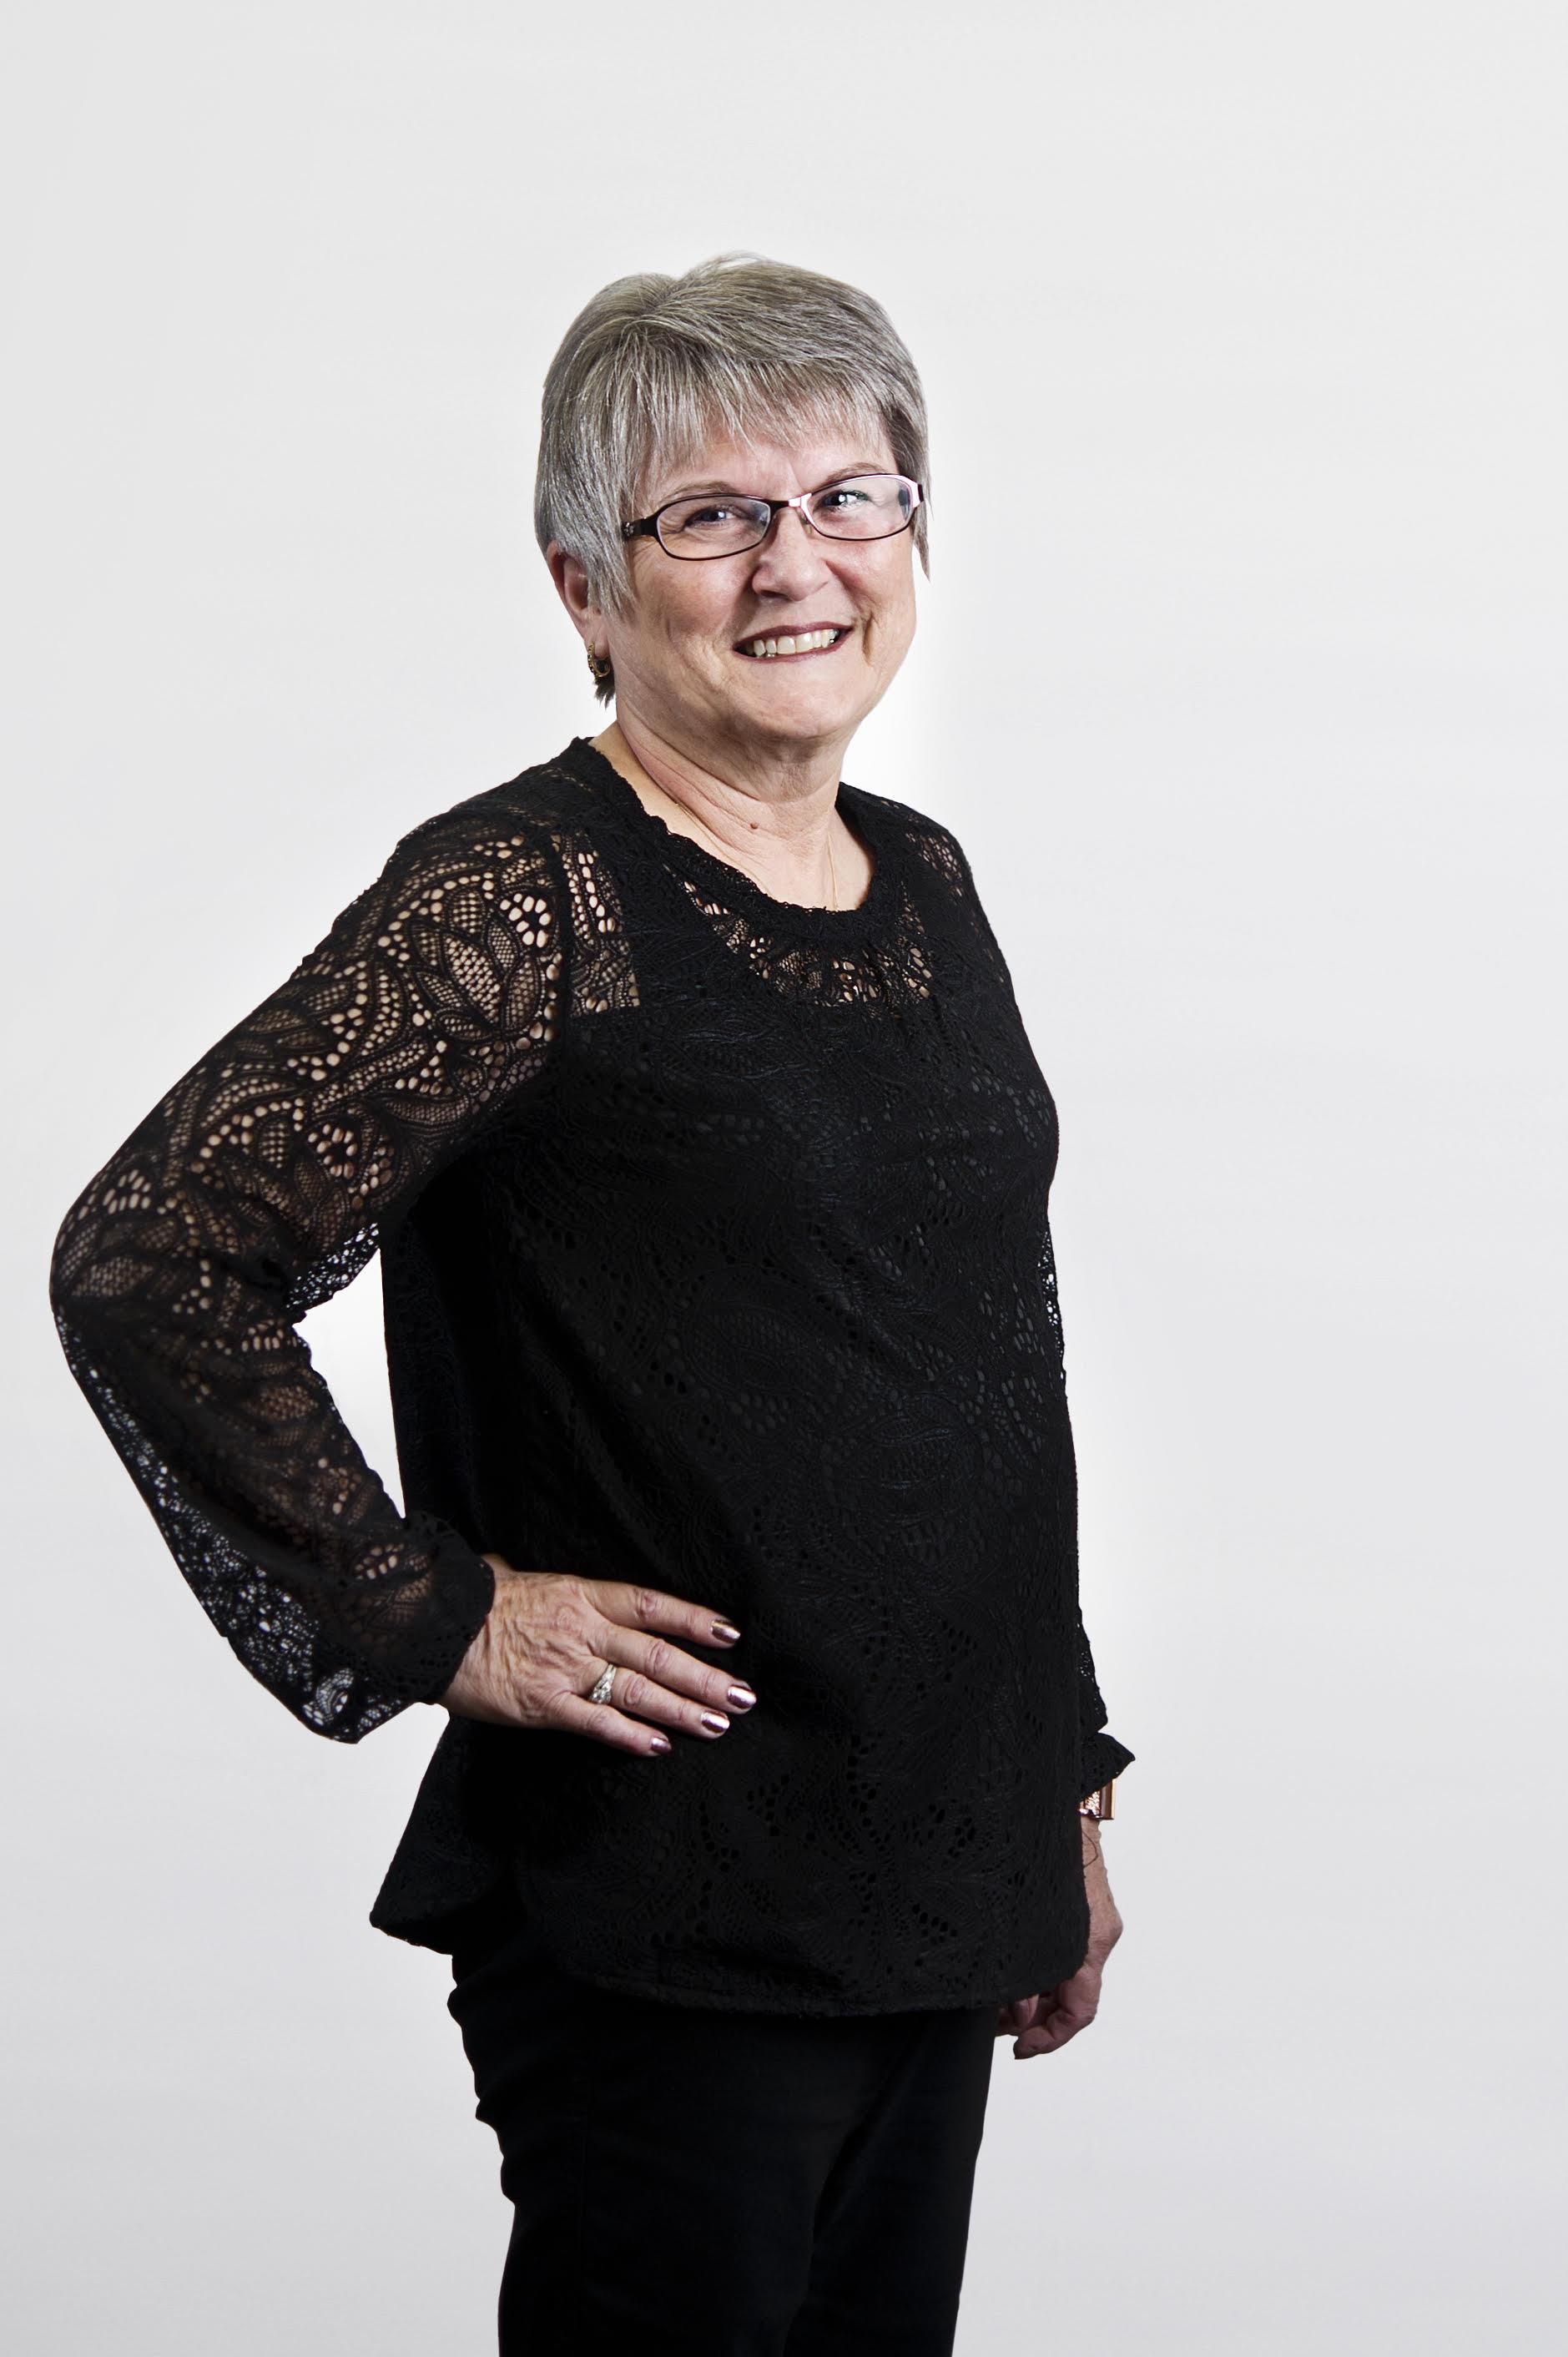 Darlene Kimoto | Accounting Clerk  (403) 317-4555 extension 2  rc_acct2@telus.net